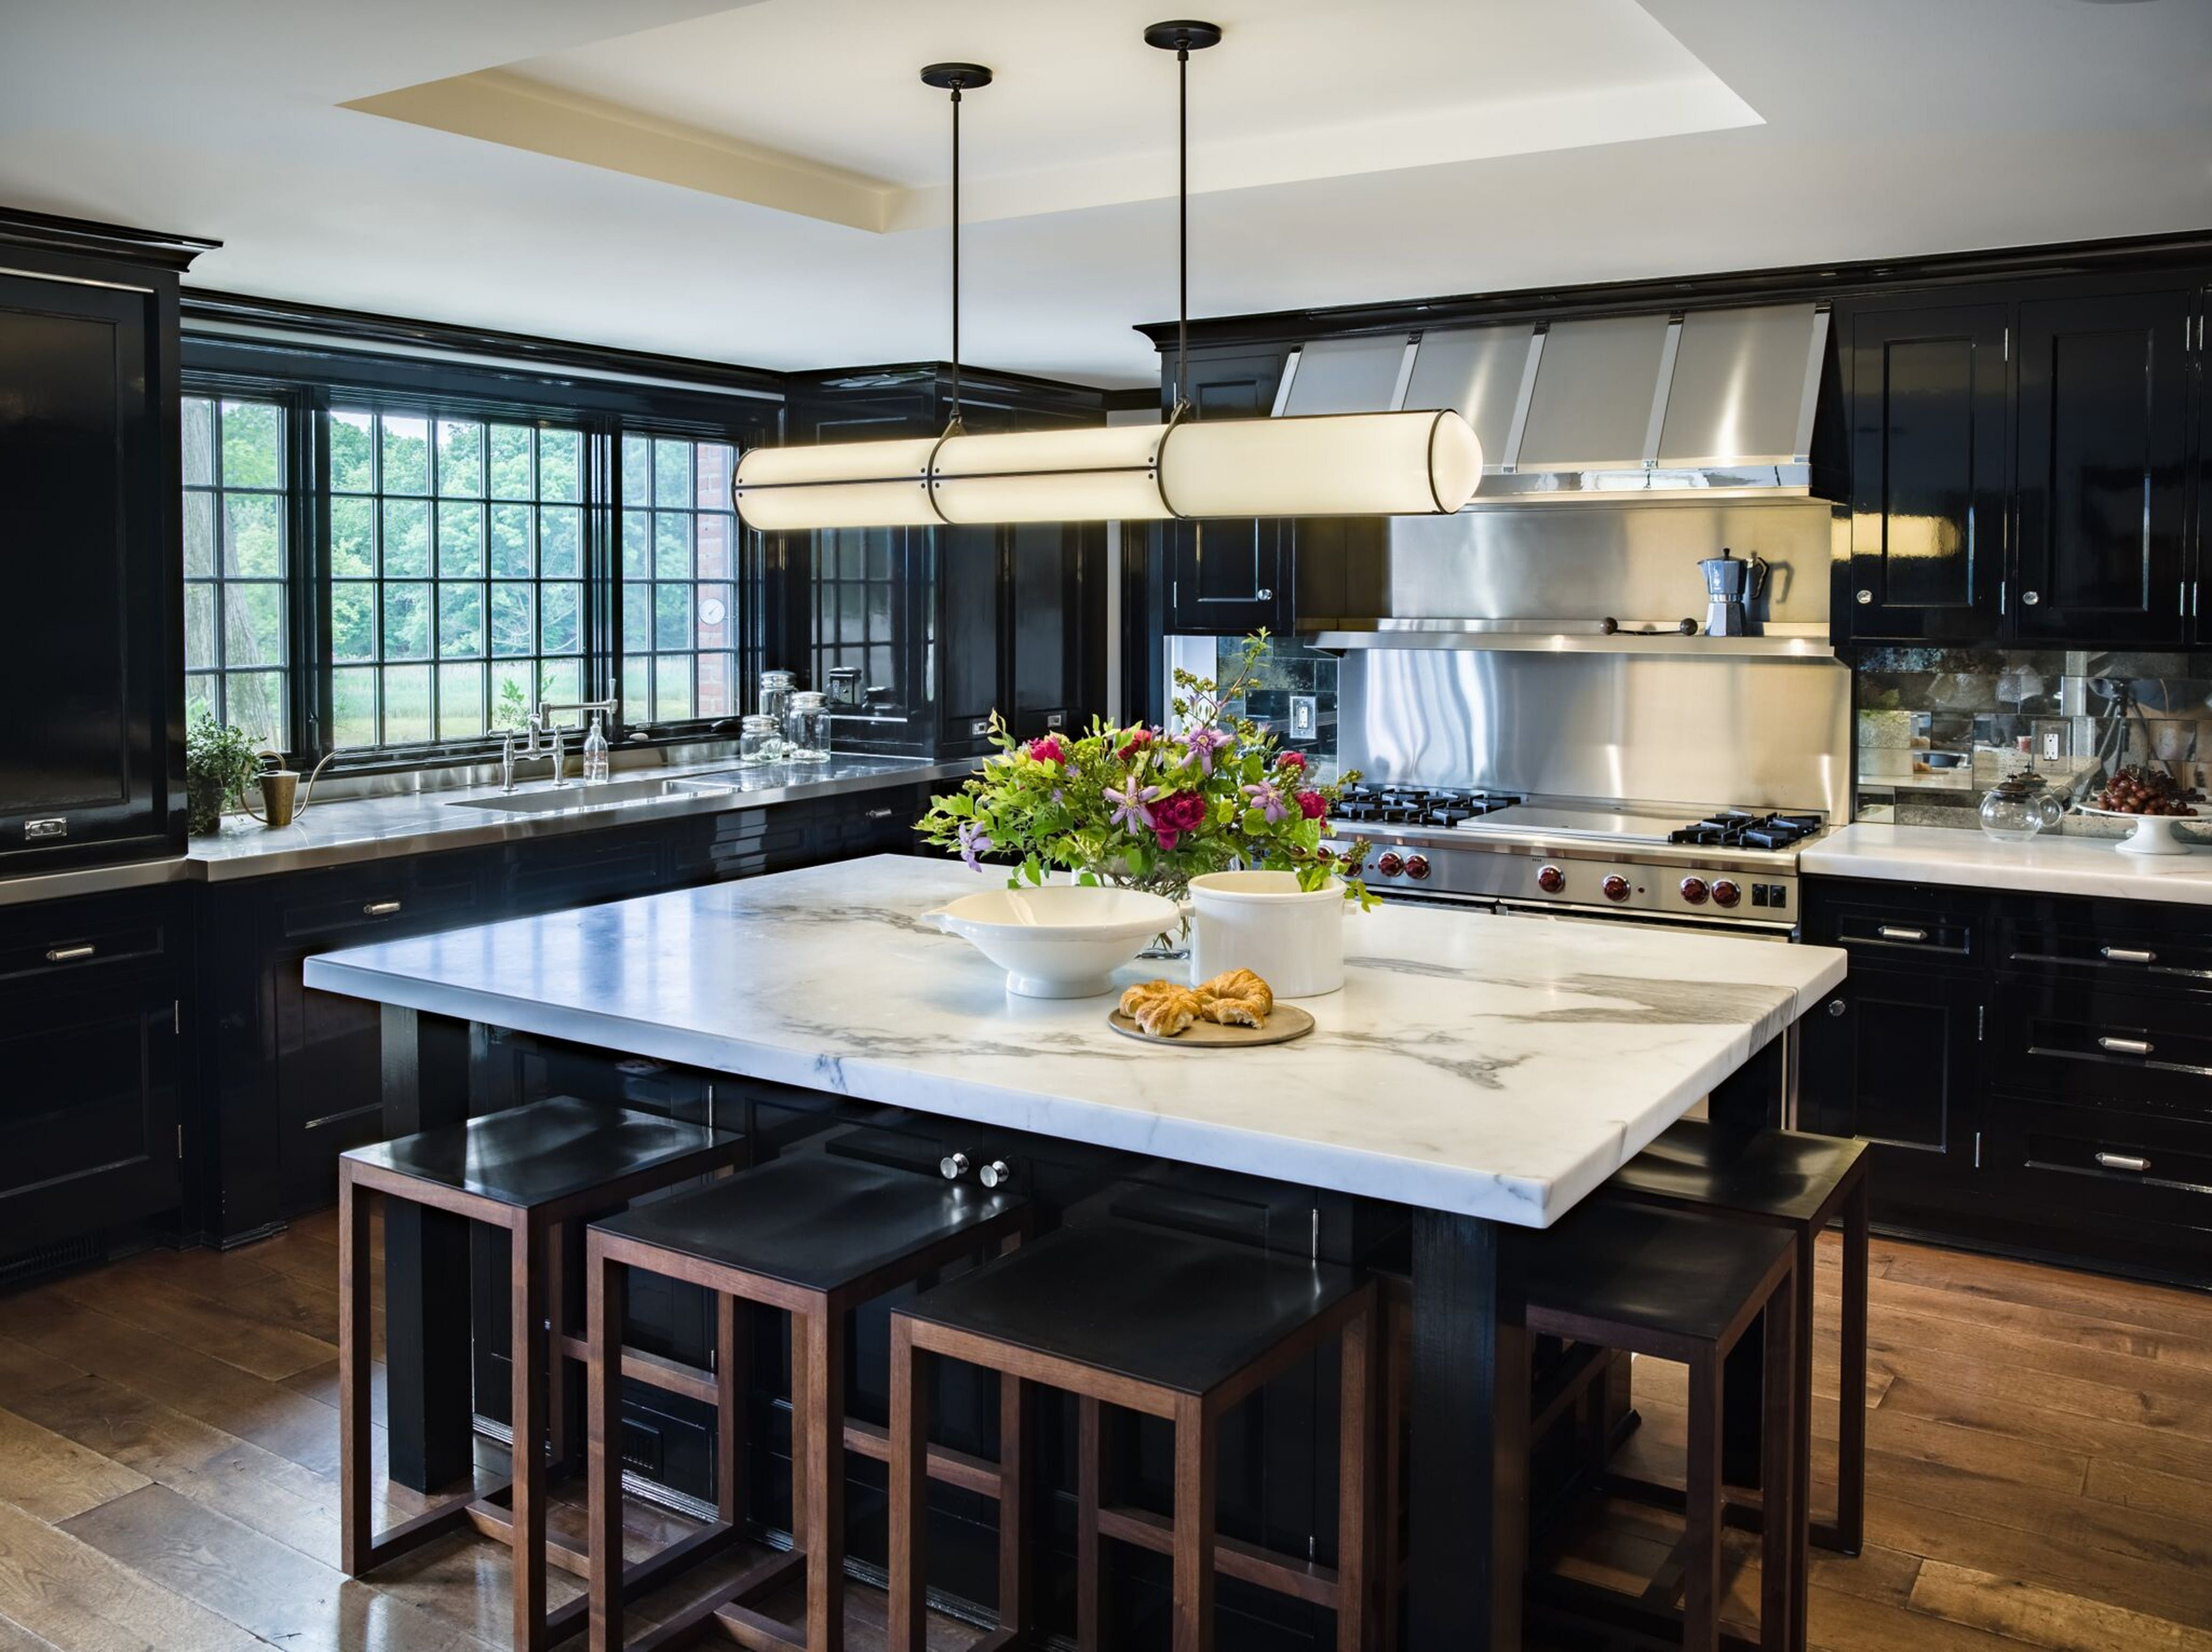 Best 29 Fabulous Kitchen Design Ideas With Dark Cabinets That 400 x 300